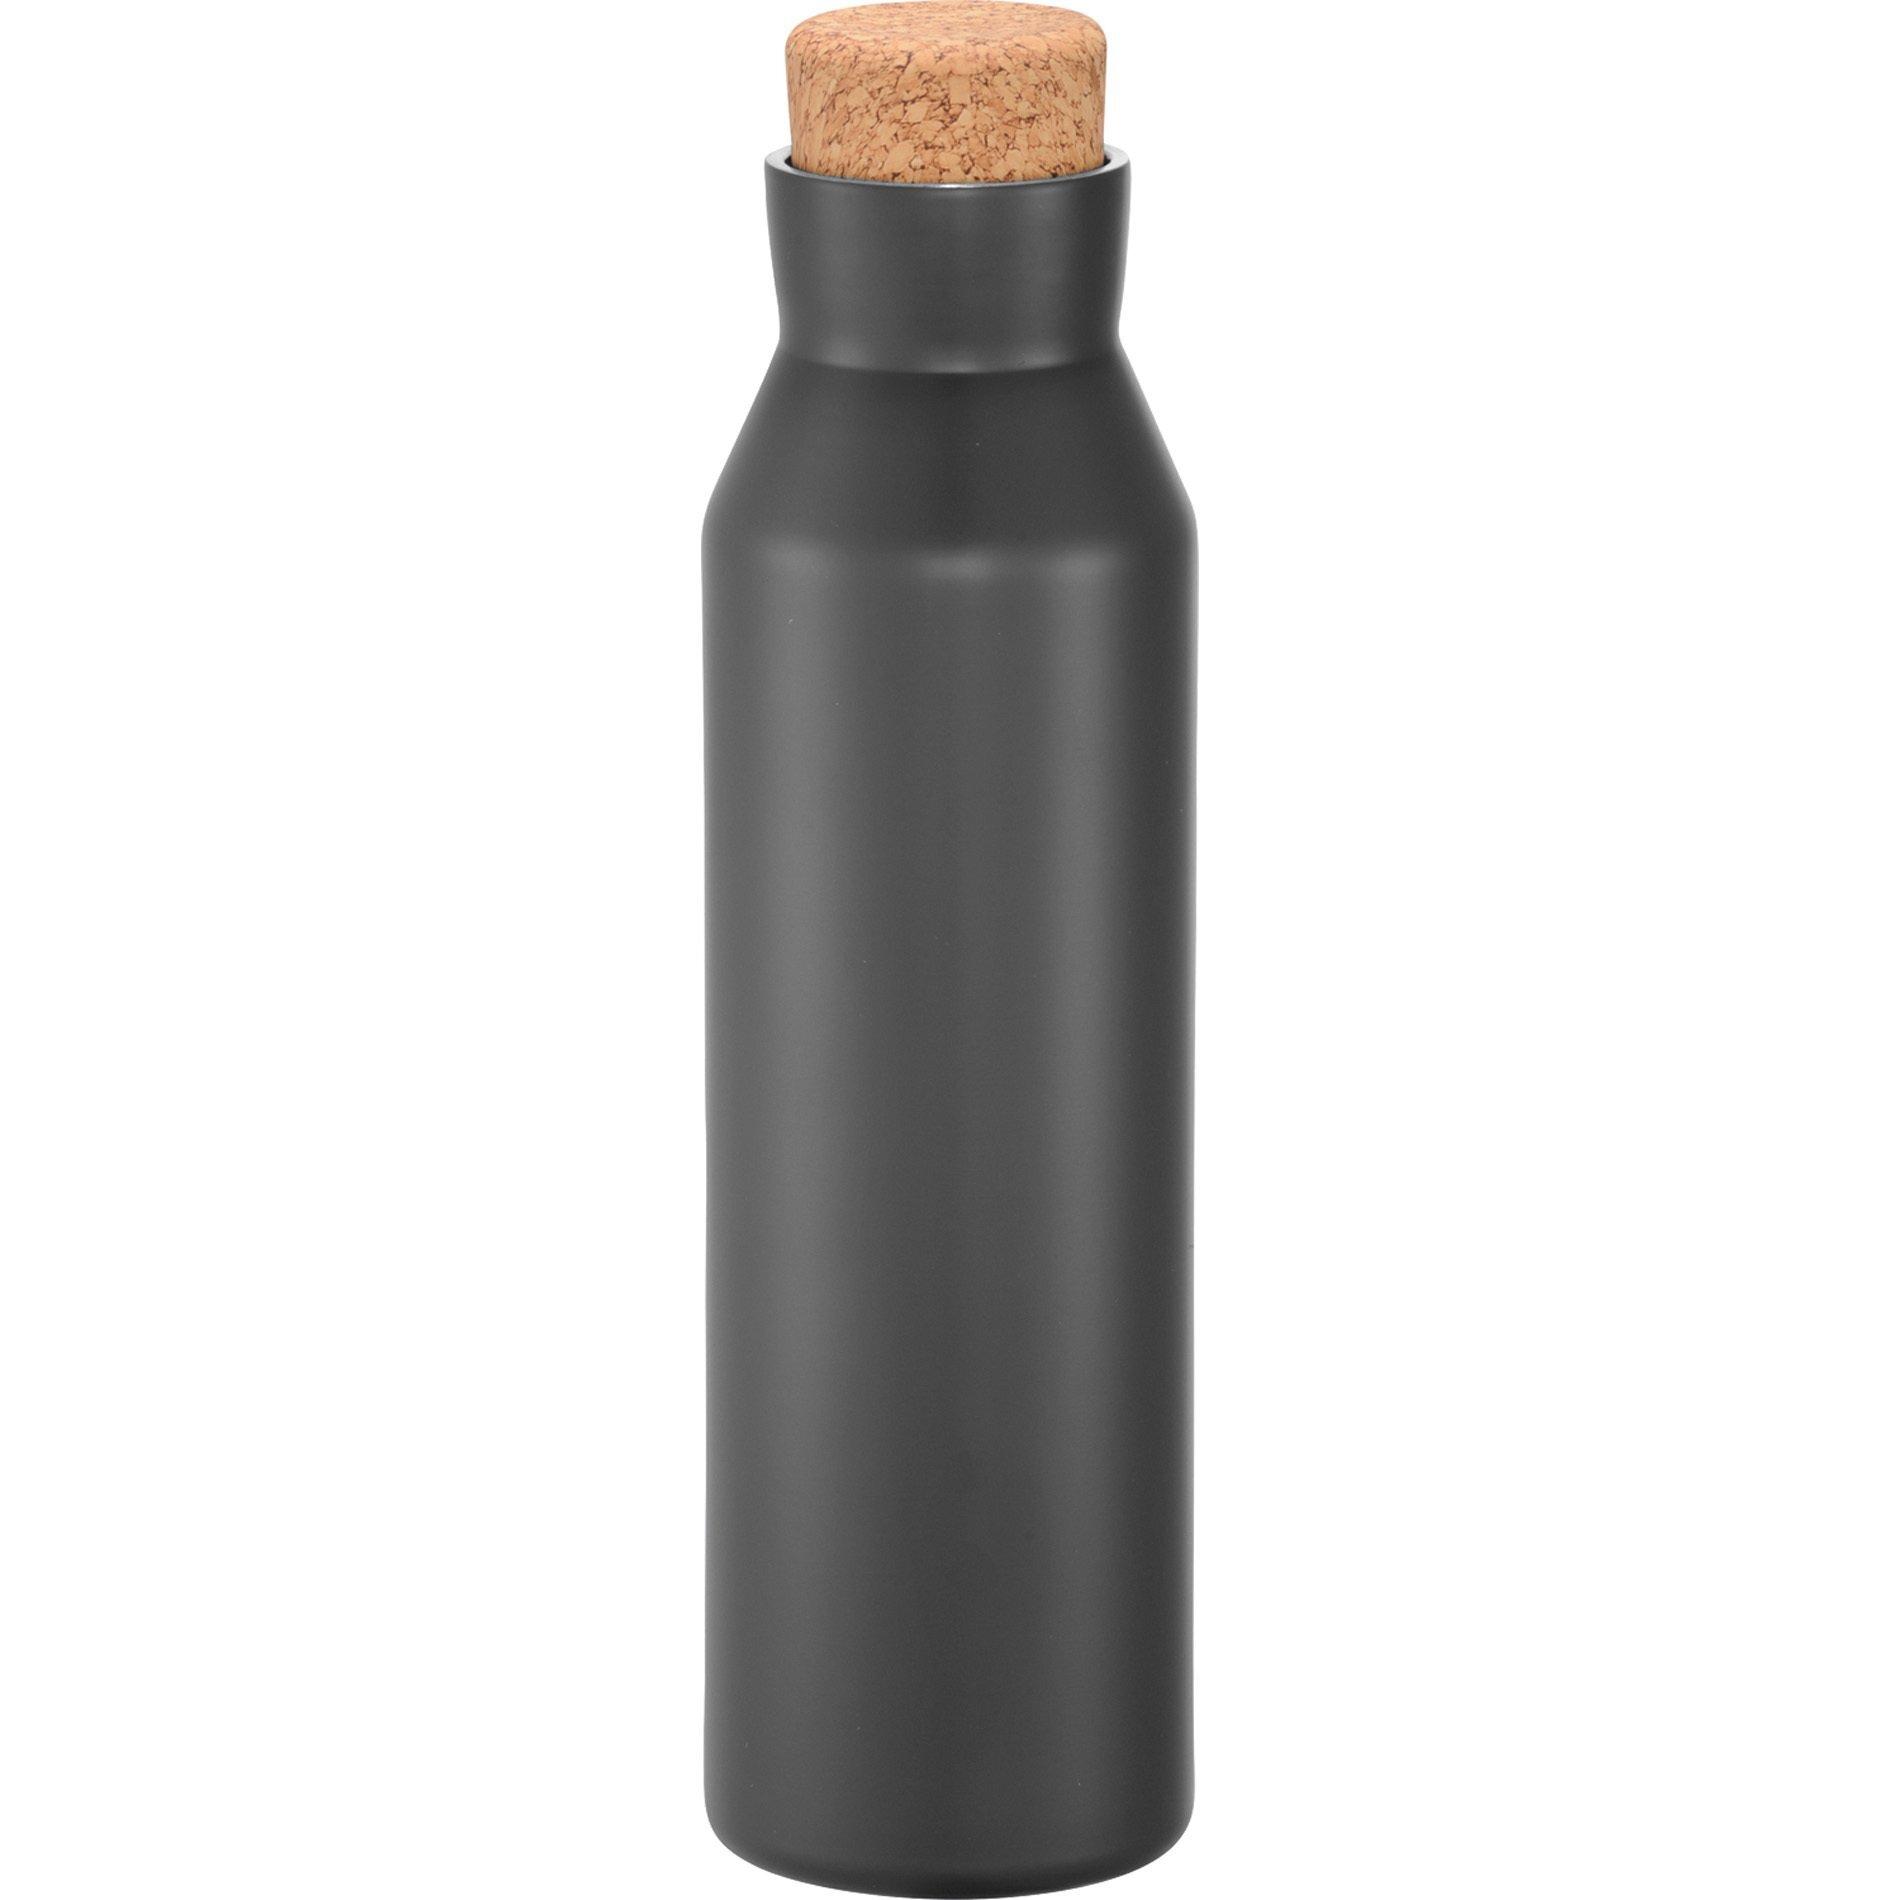 Norse Copper Vacuum Insulated Bottle w/ Cork Top, 20oz